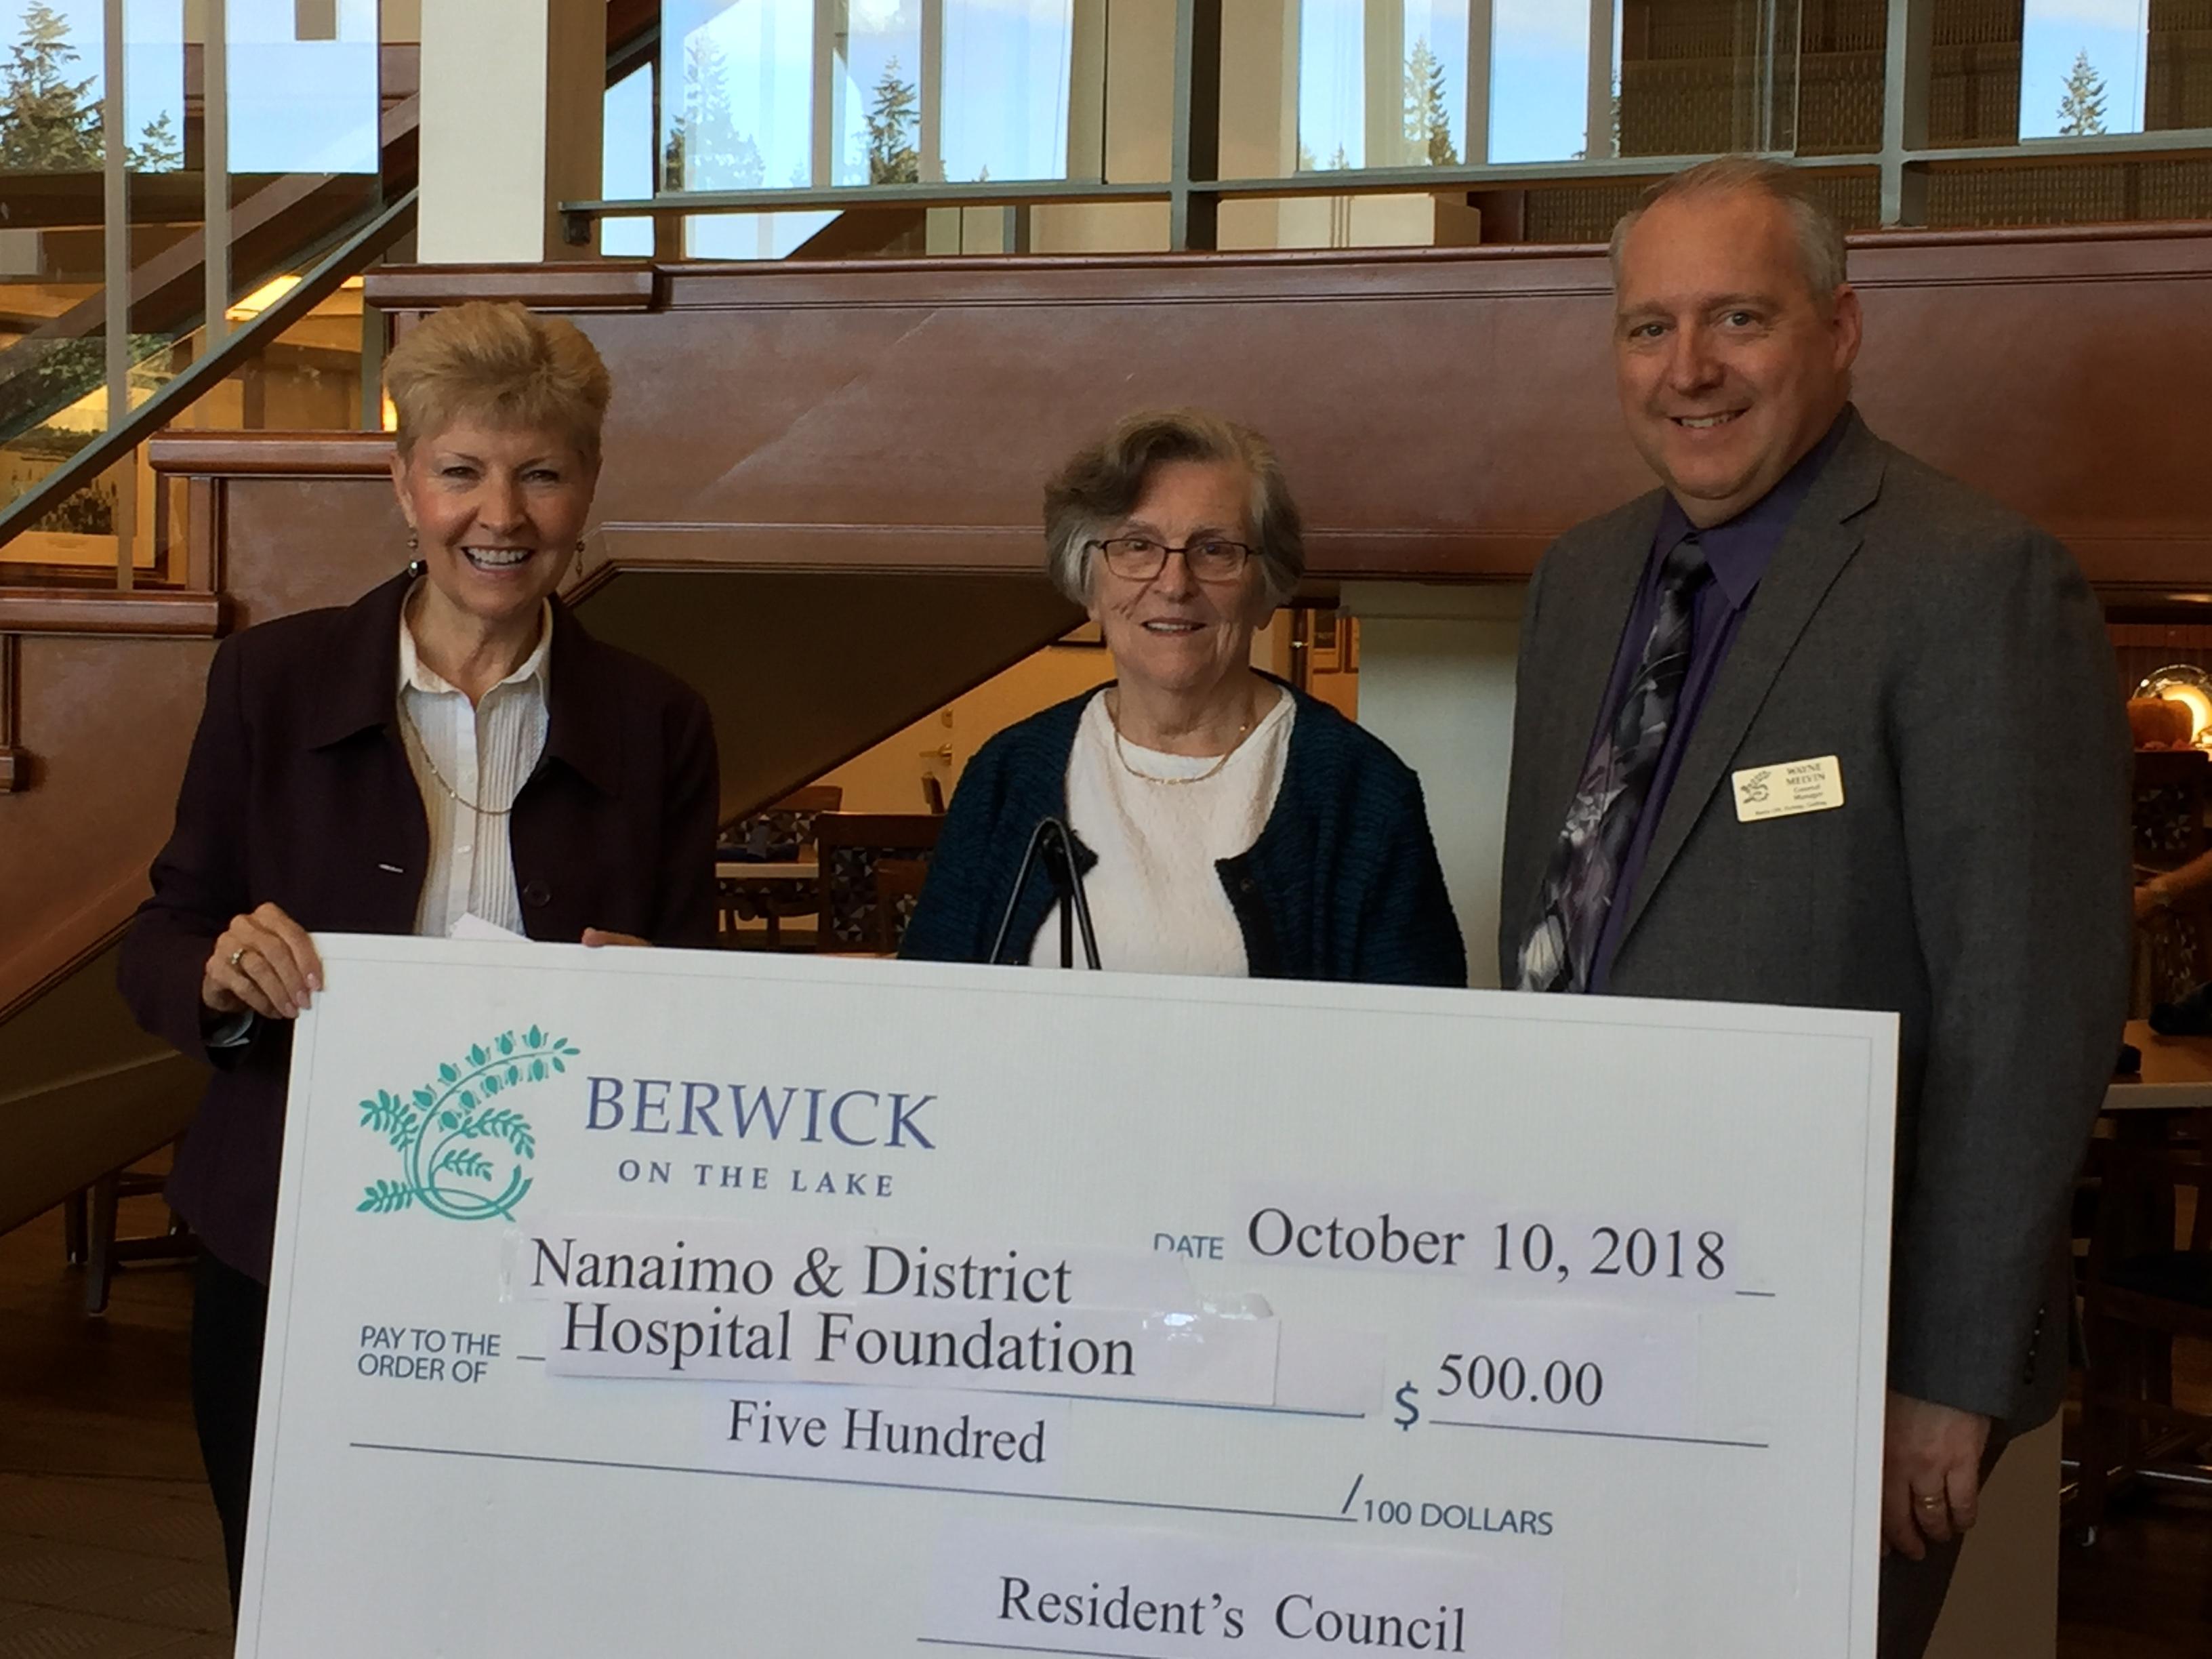 Berwick on the Lake donates $500